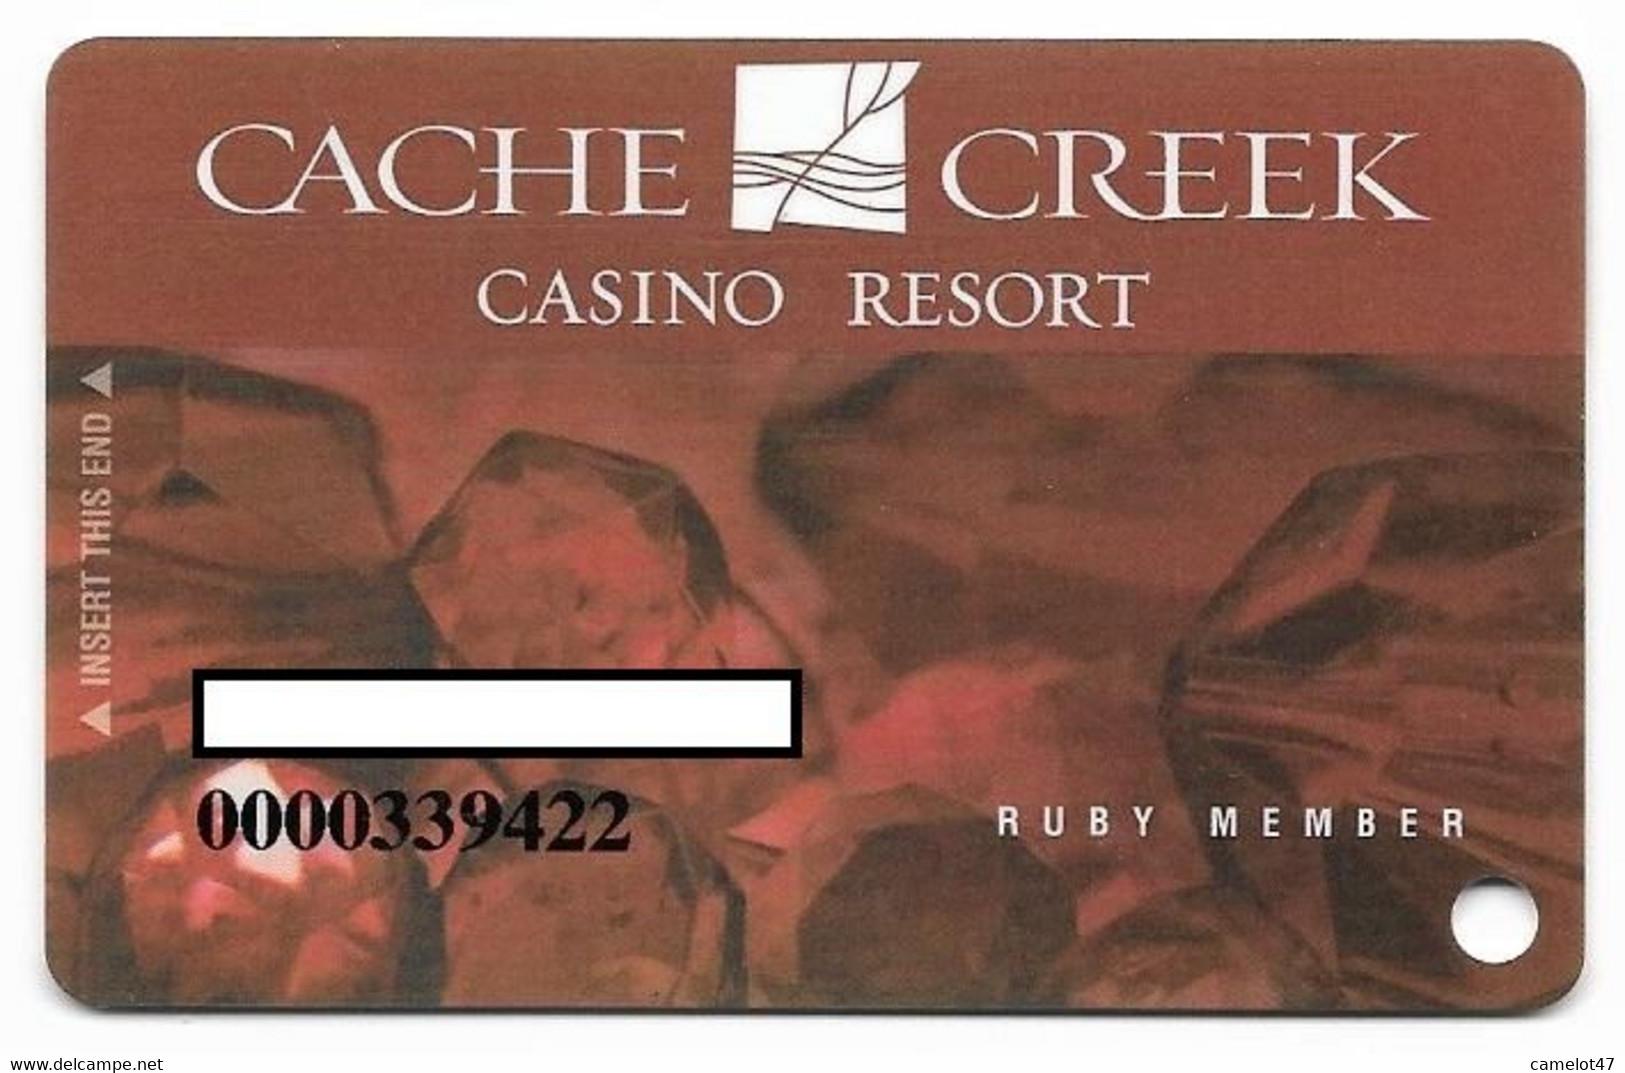 Cache Creek Casino, Brooks, CA, U.S.A., Older Used Slot Or Player's Card, # Cachecreek-4 - Casino Cards